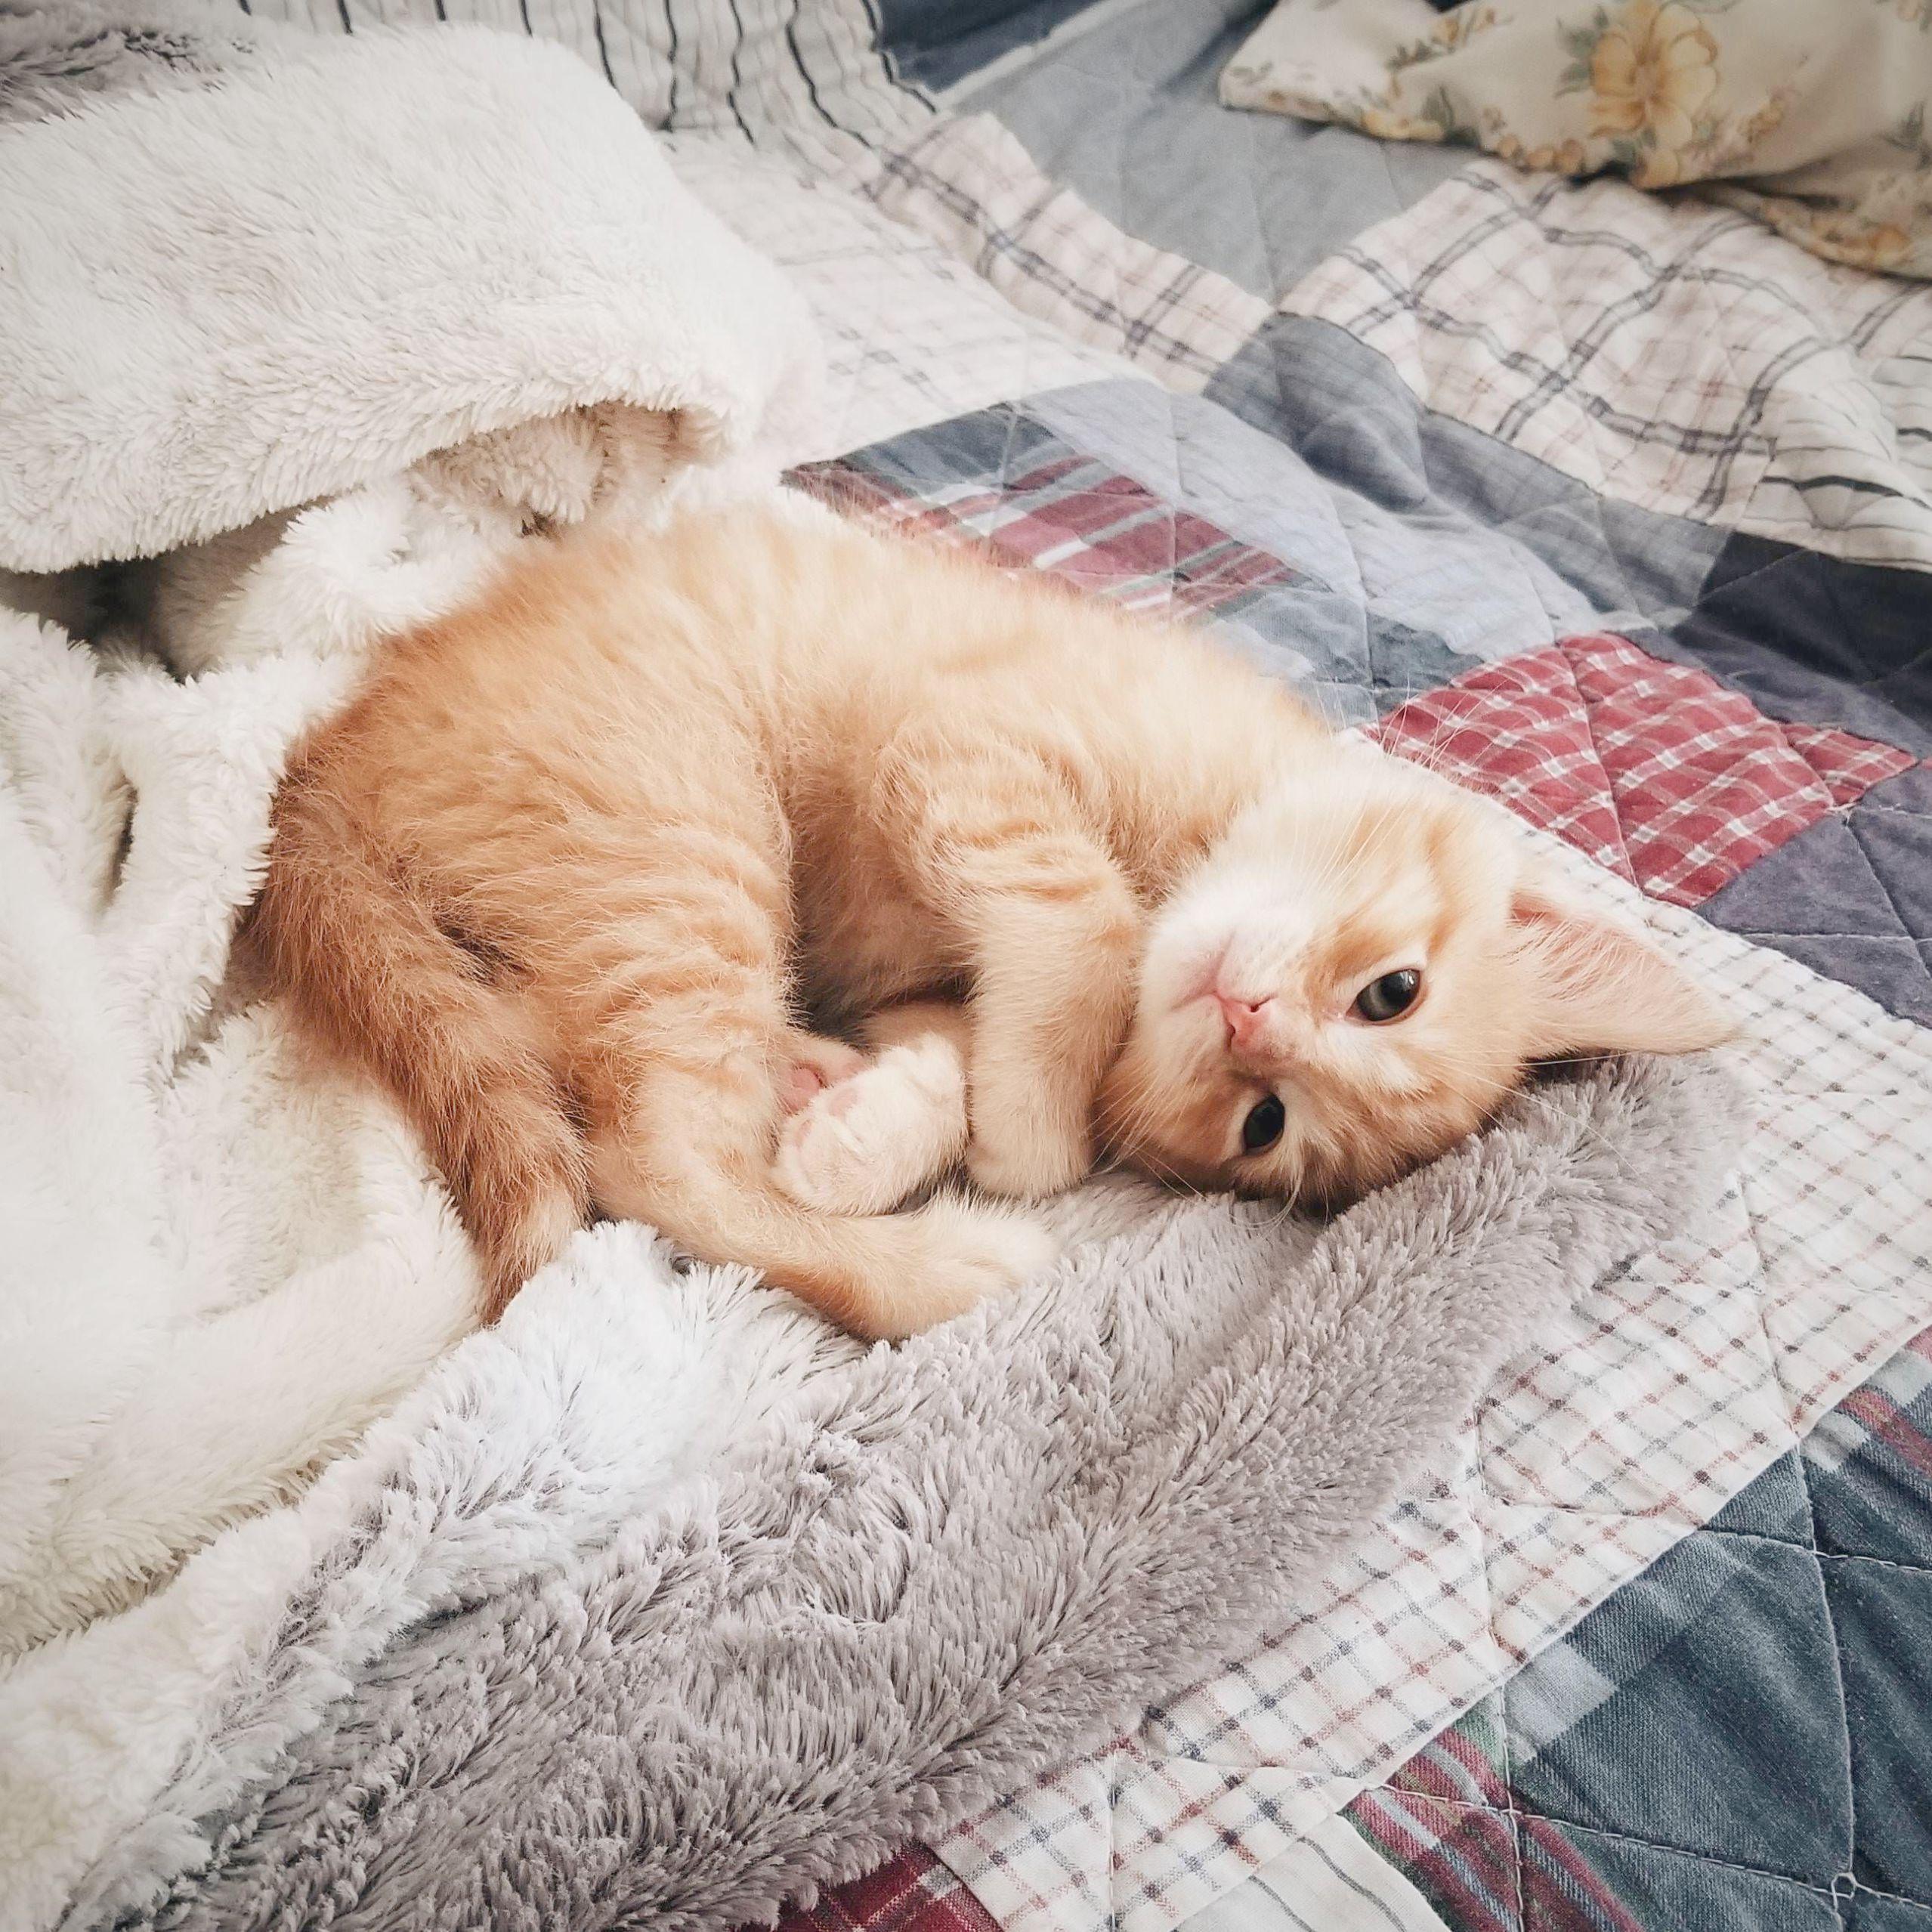 Funny Cat Desktop Wallpapers Wallpaper Cave Kucing Menggambar Kucing Gambar Kucing Lucu